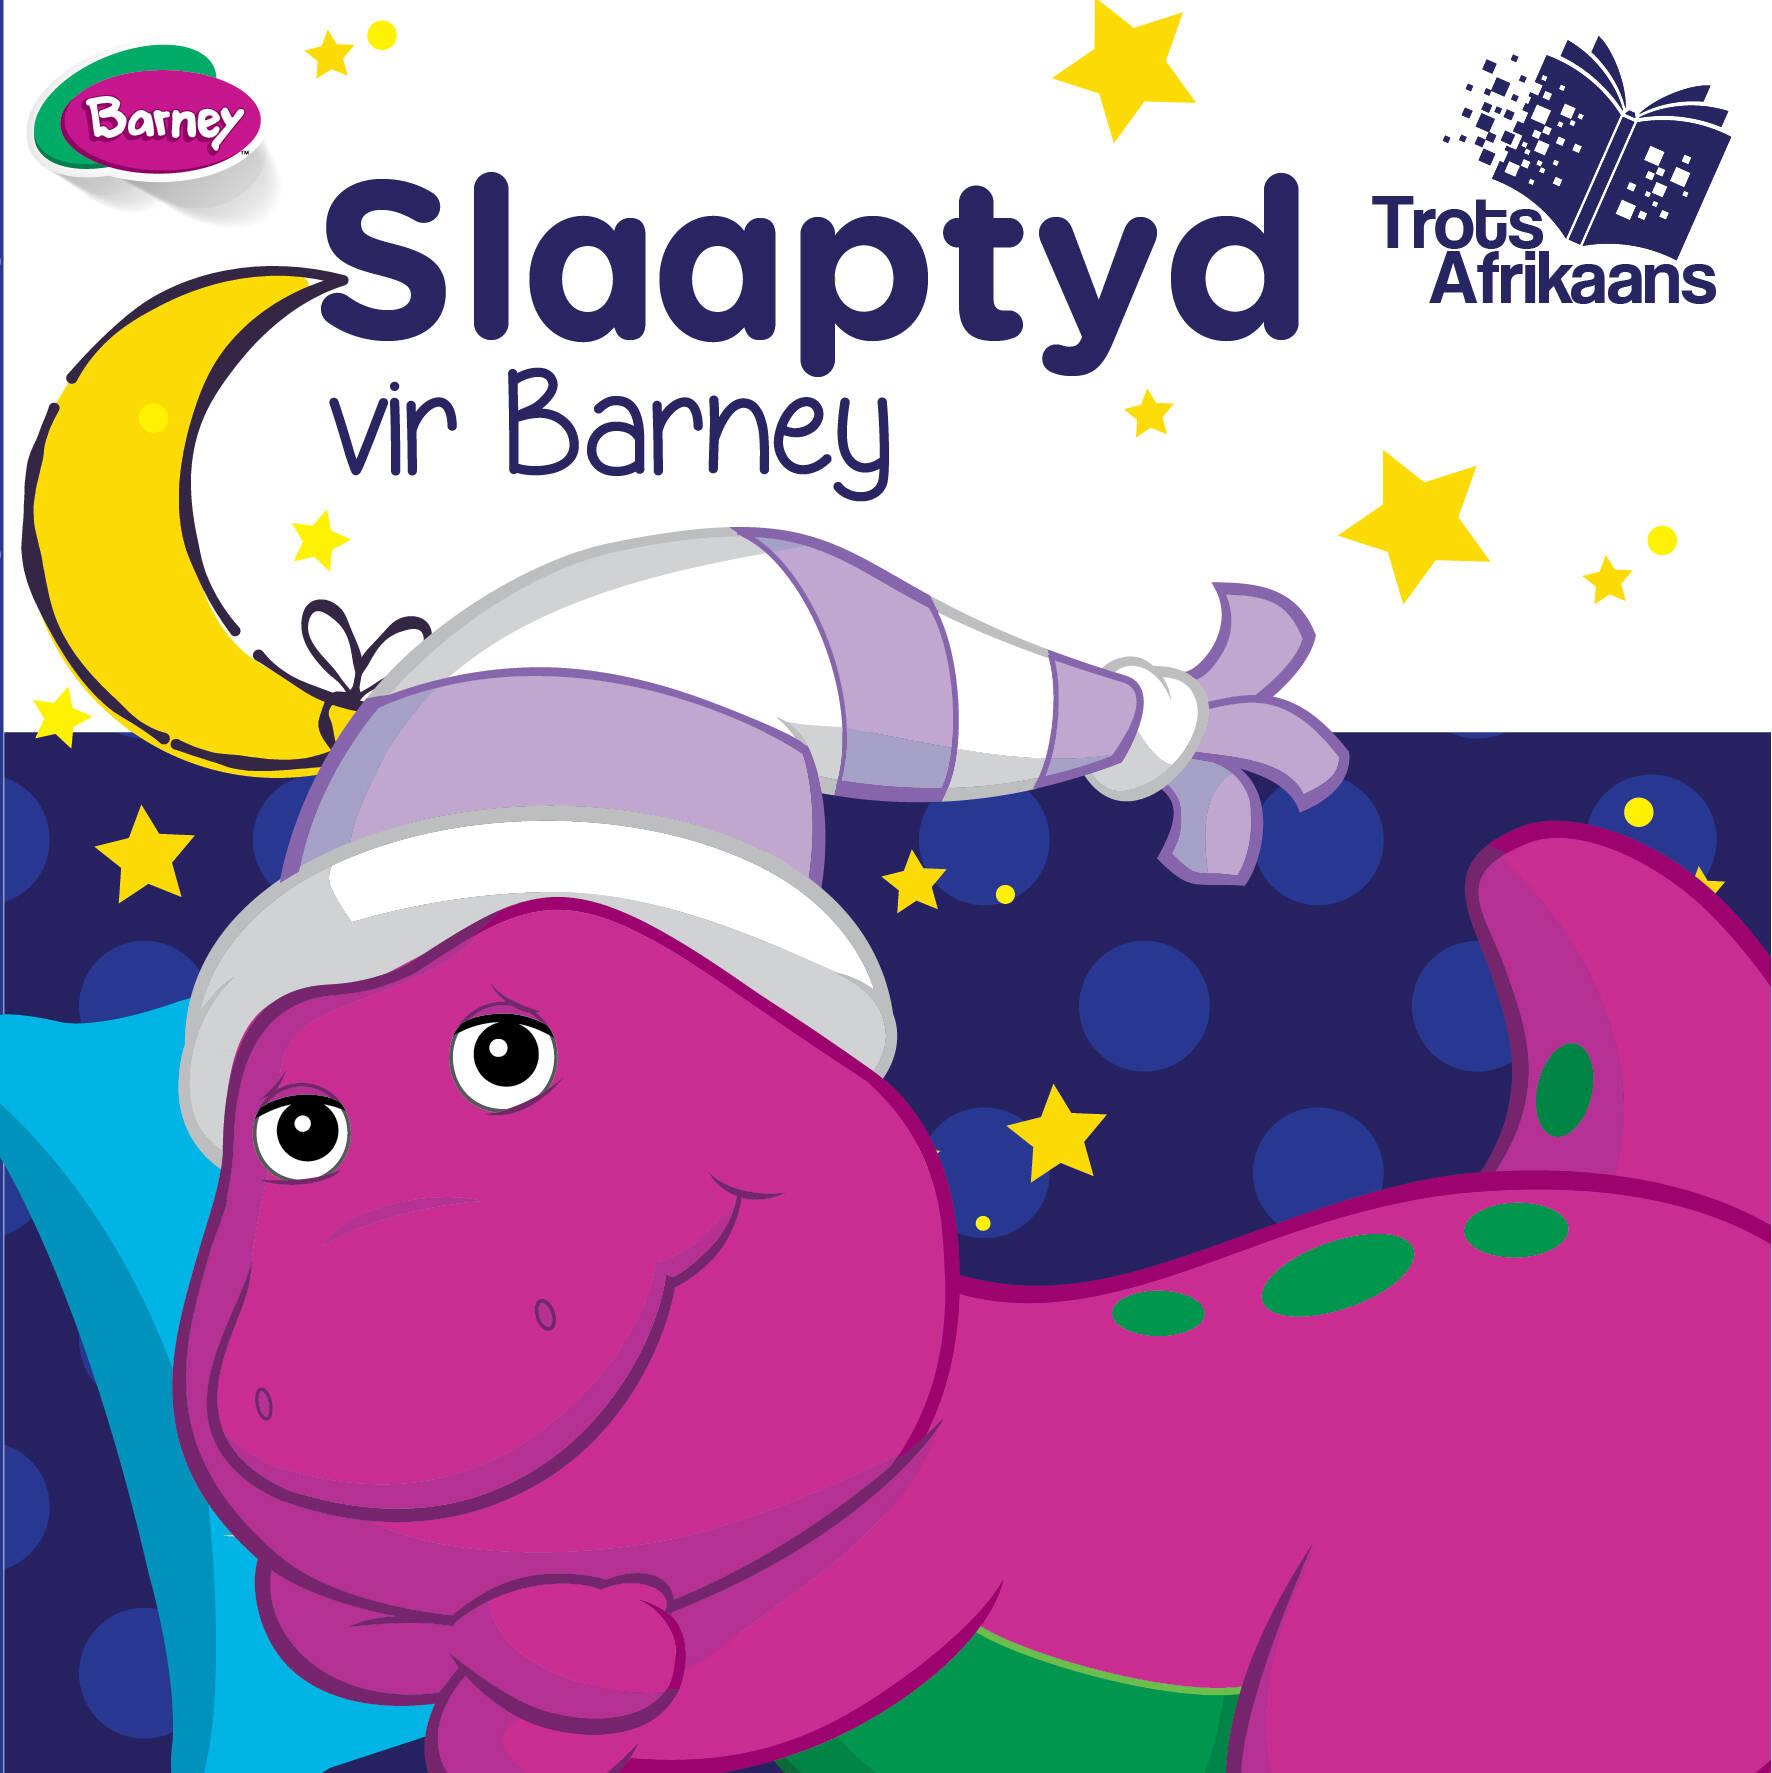 Barney Bord Boek - Slaaptyd Vir Barney